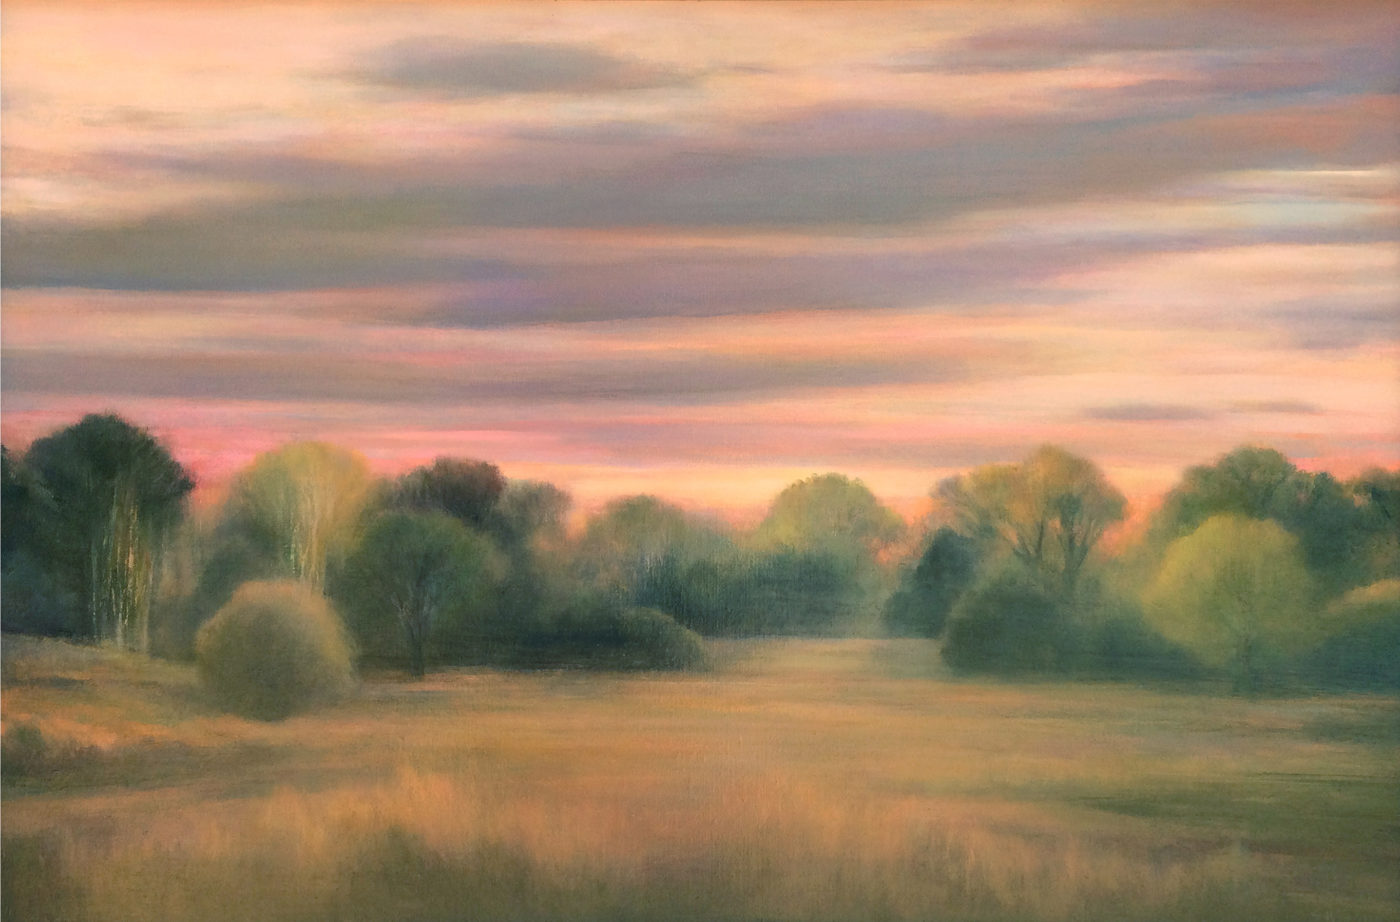 Evening Expanse